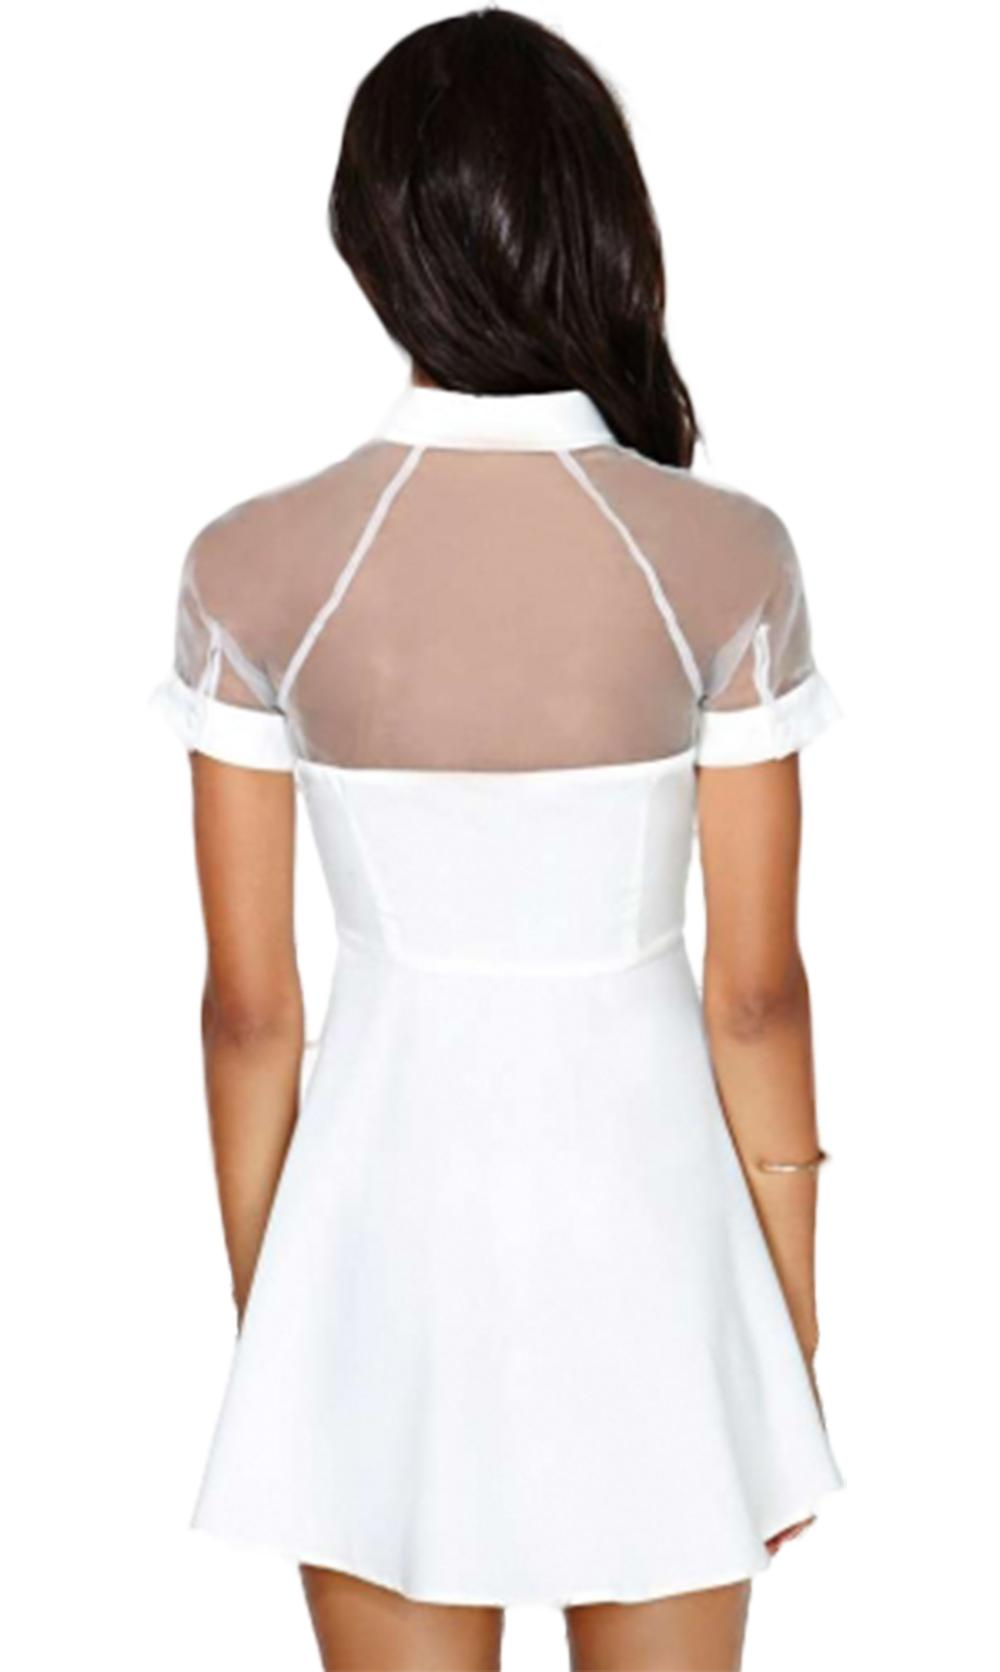 Waooh - transparent dress neckline Ozee